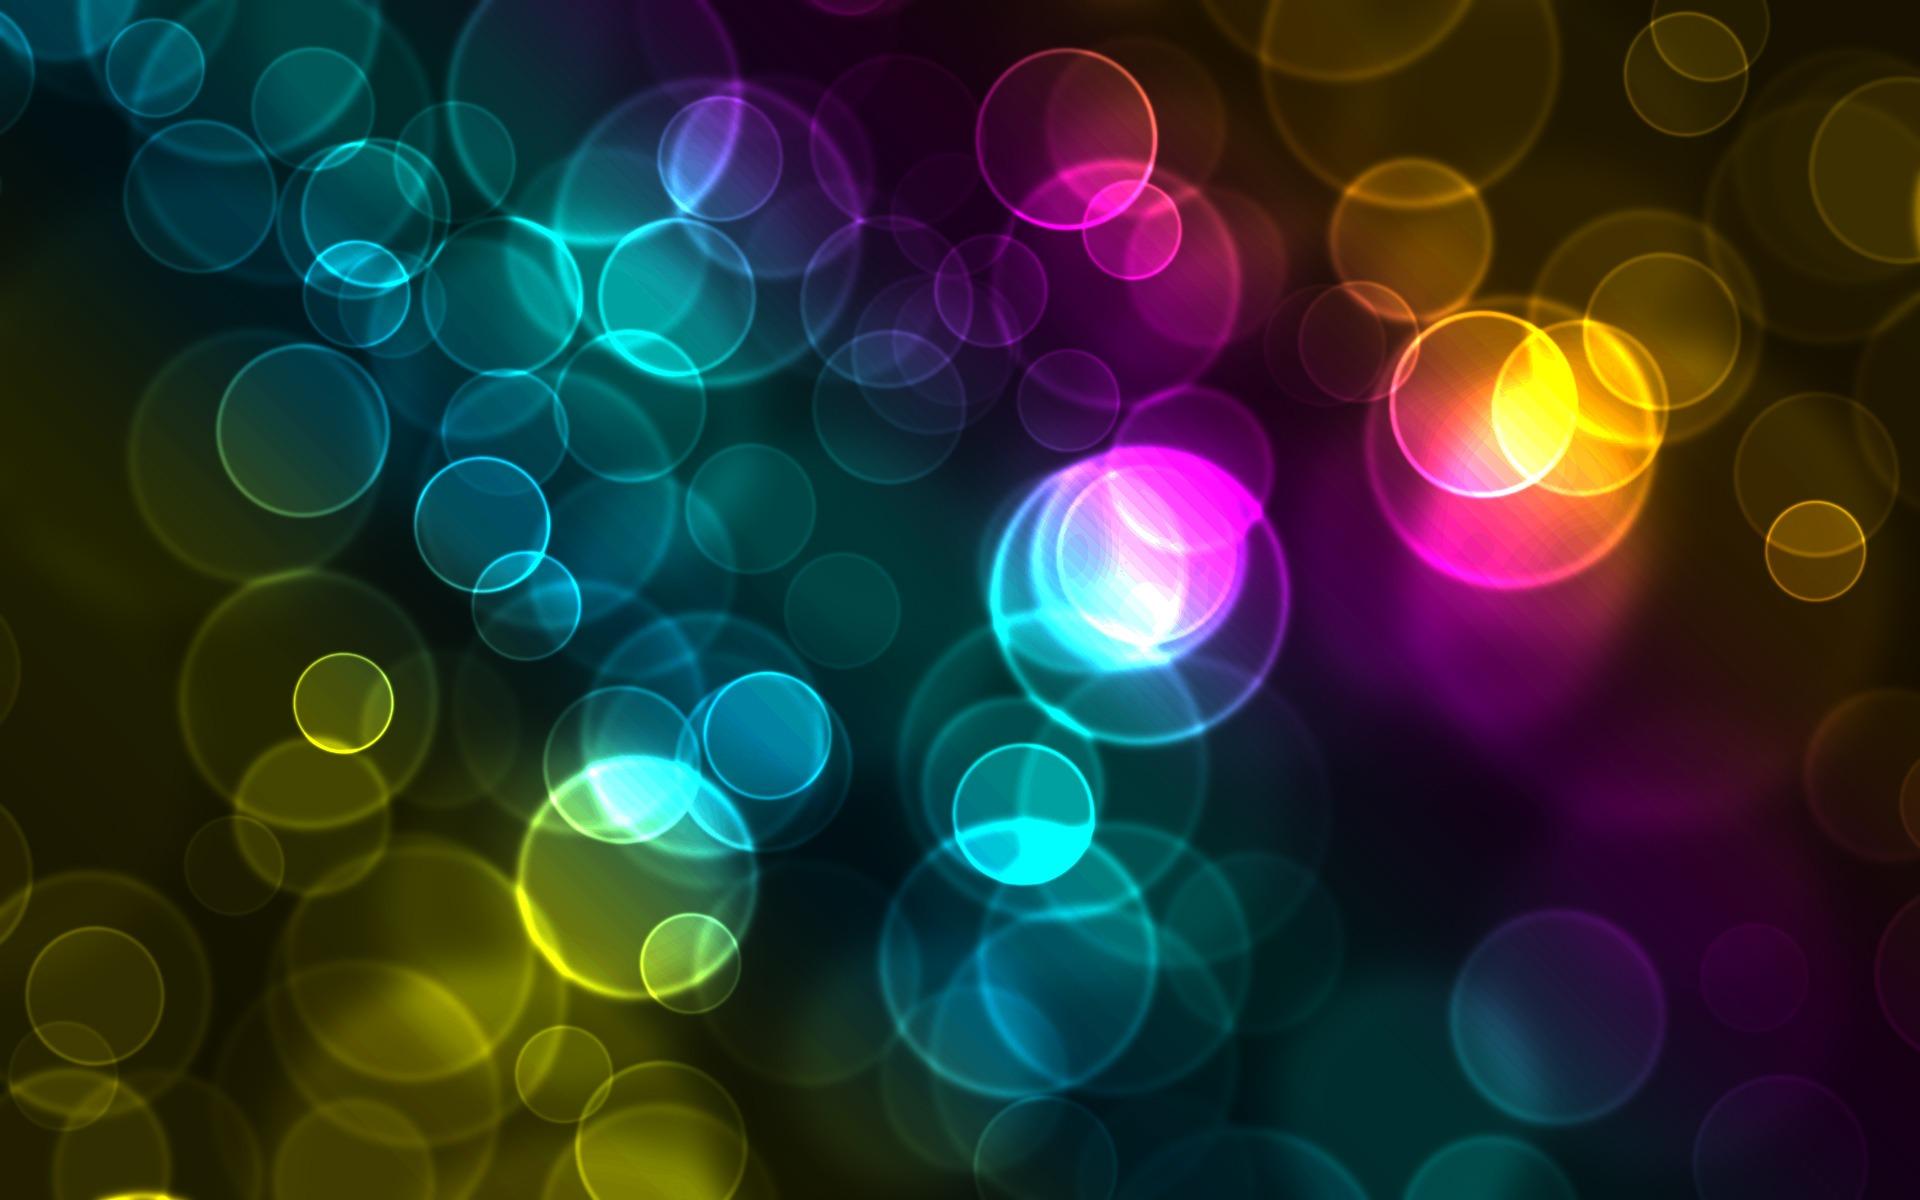 Colorful Bokeh Wallpaper